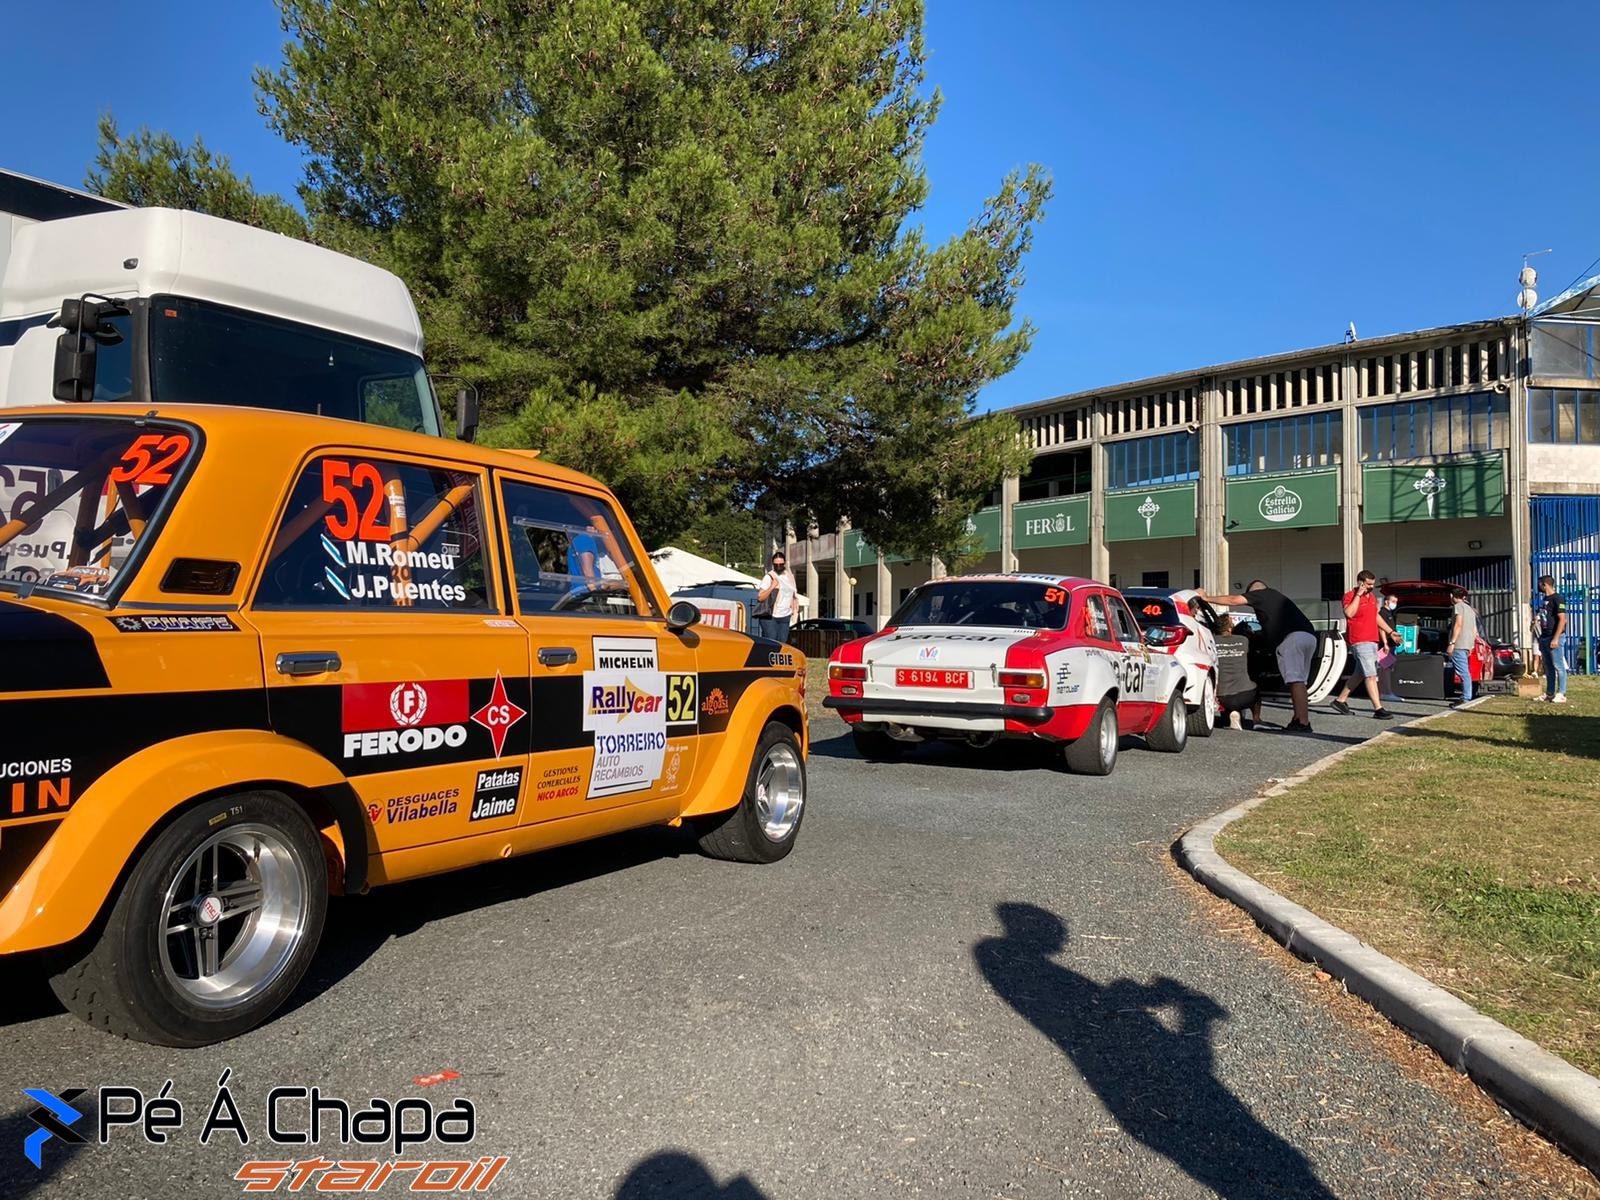 SCER + TER: 52º Rallye de Ferrol - Suzuki [20-21 Agosto] E9LE_WrWEAYH1L7?format=jpg&name=large